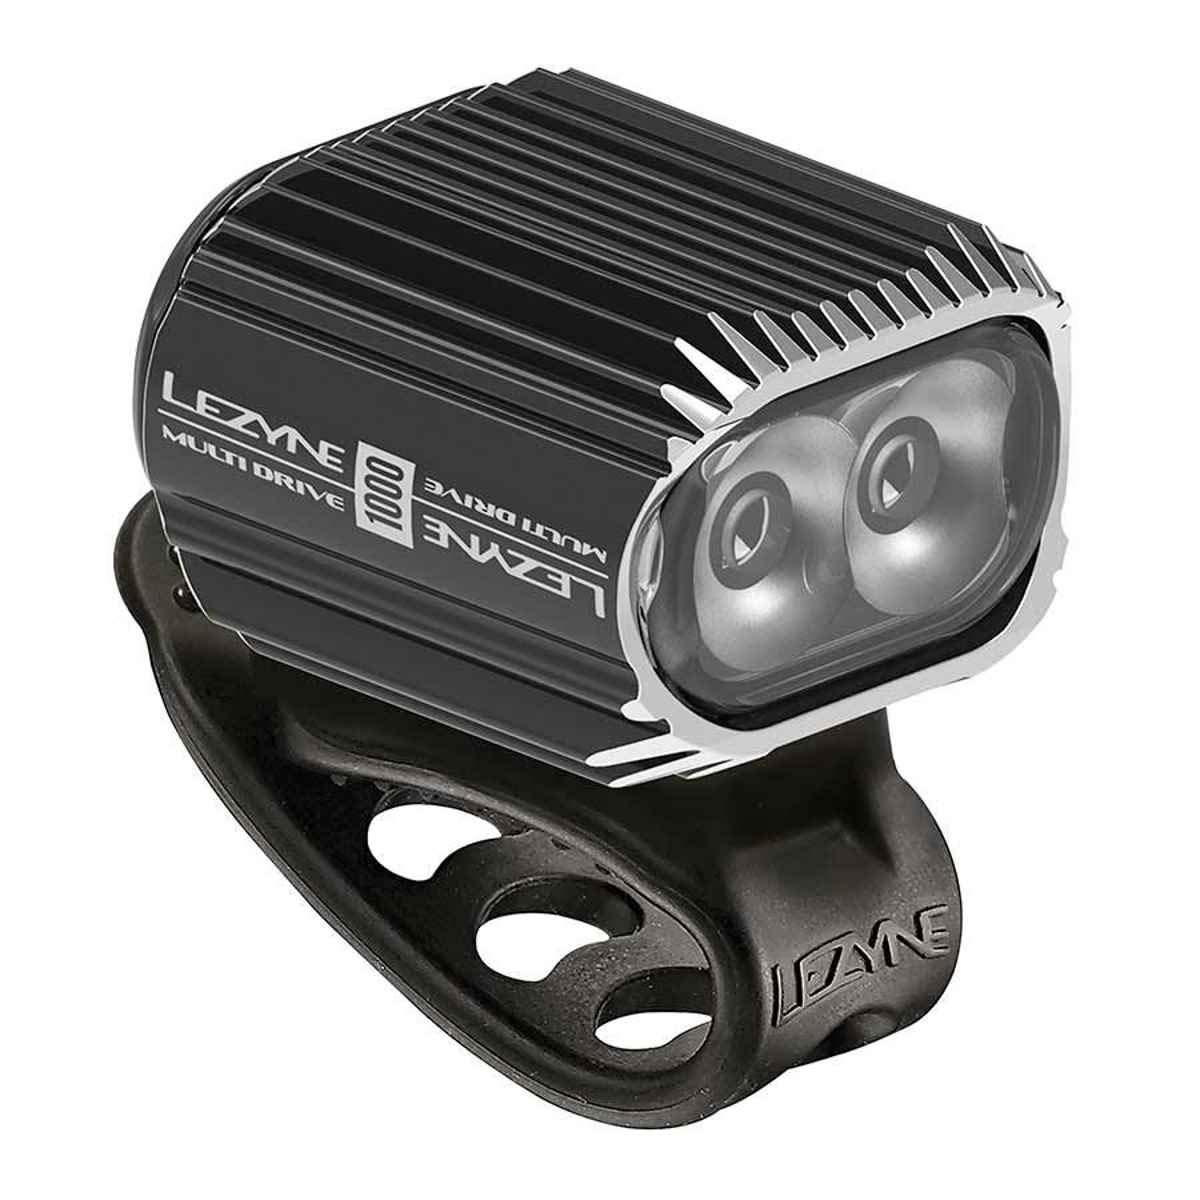 Lezyne 1-led-27 F-v104 Beleuchtung Fahrrad Unisex Erwachsene, schwarz hi Gloss